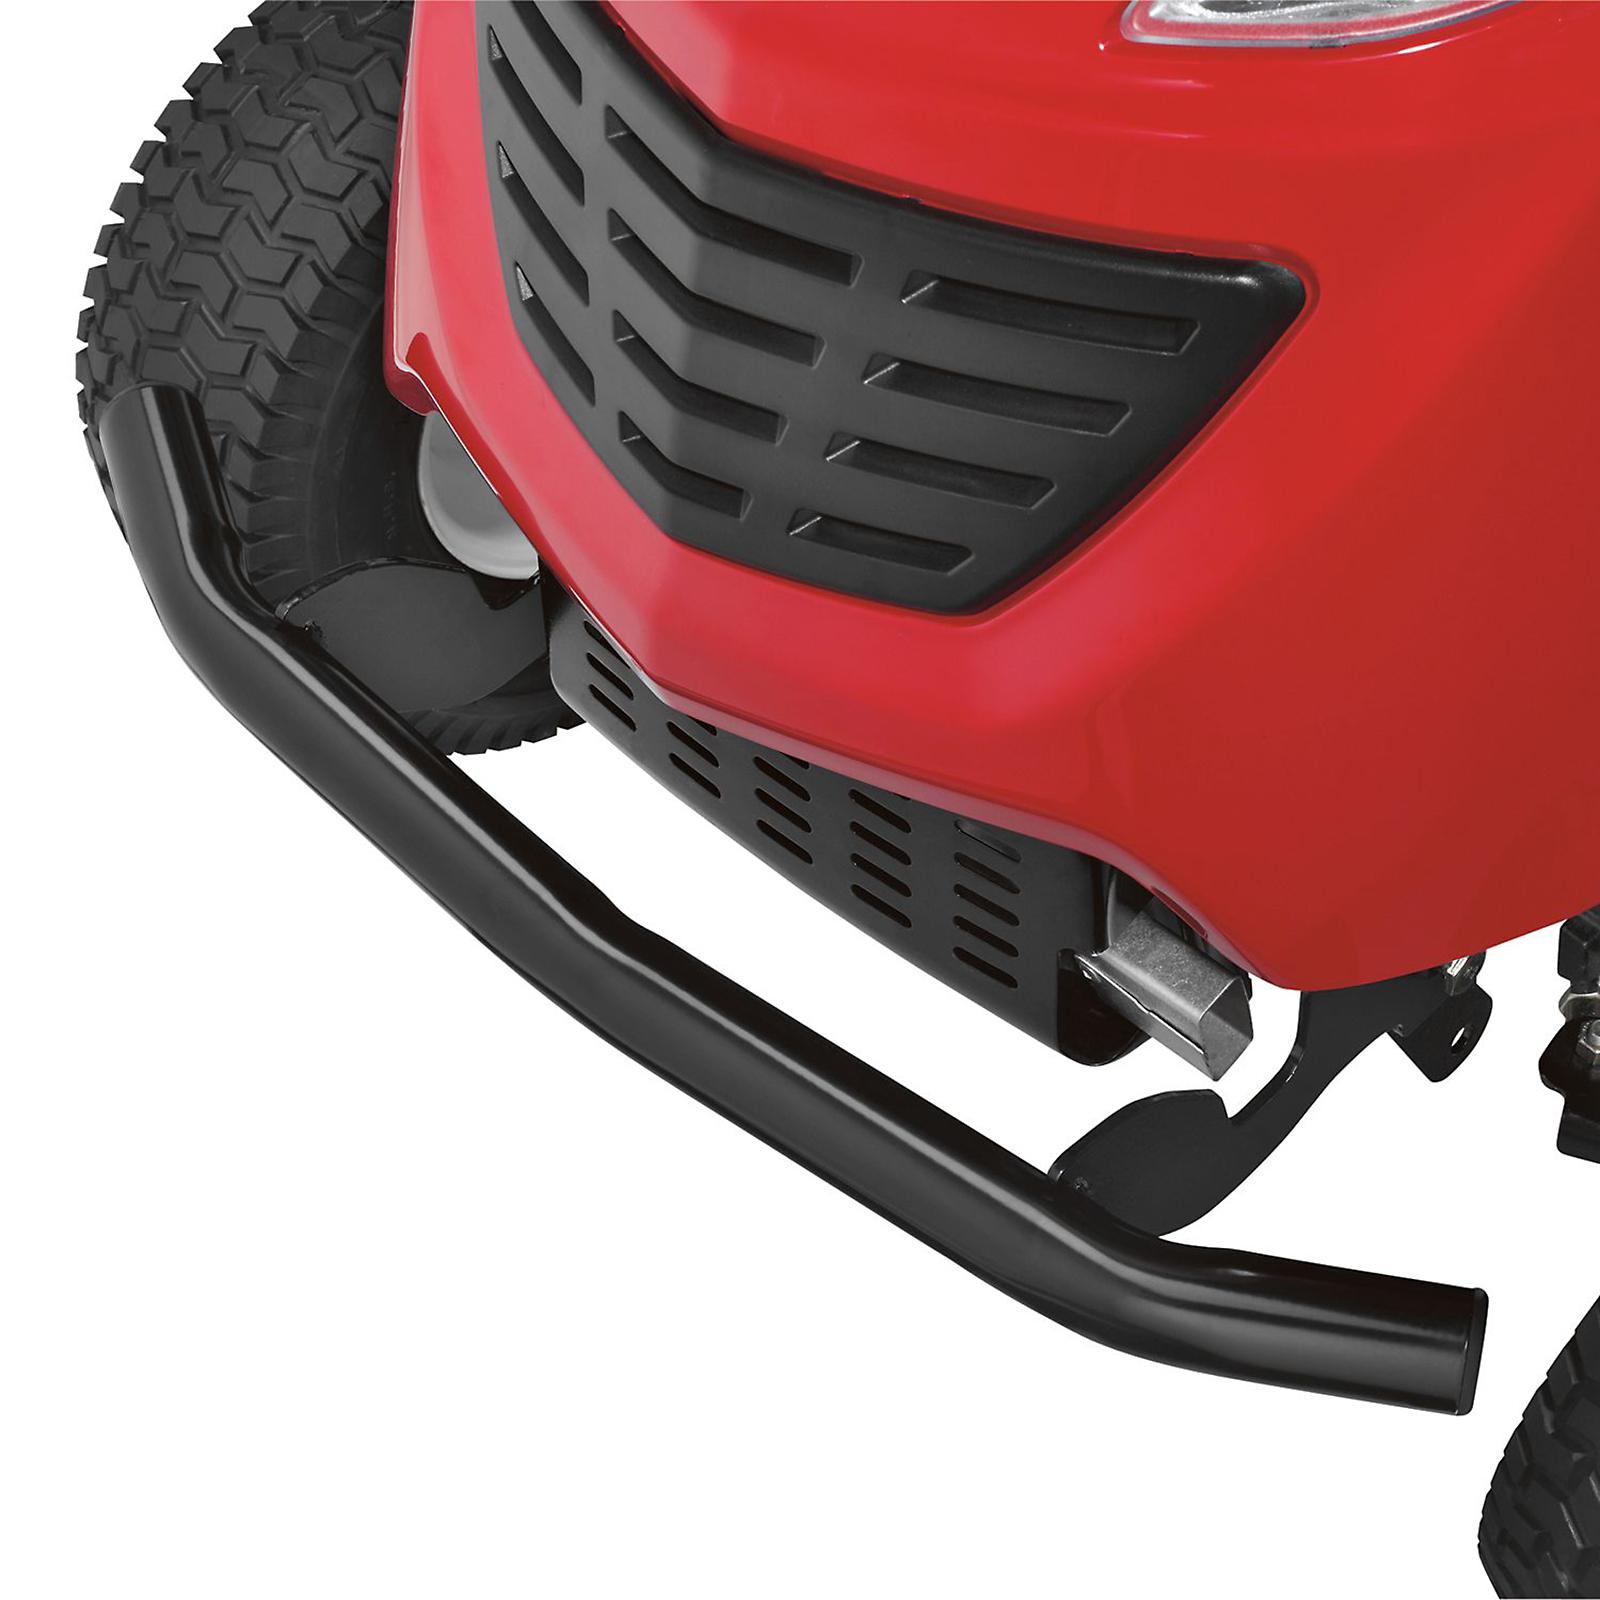 MTD Pro Front Bumper Kit - Lawn & Garden - Tractor ...